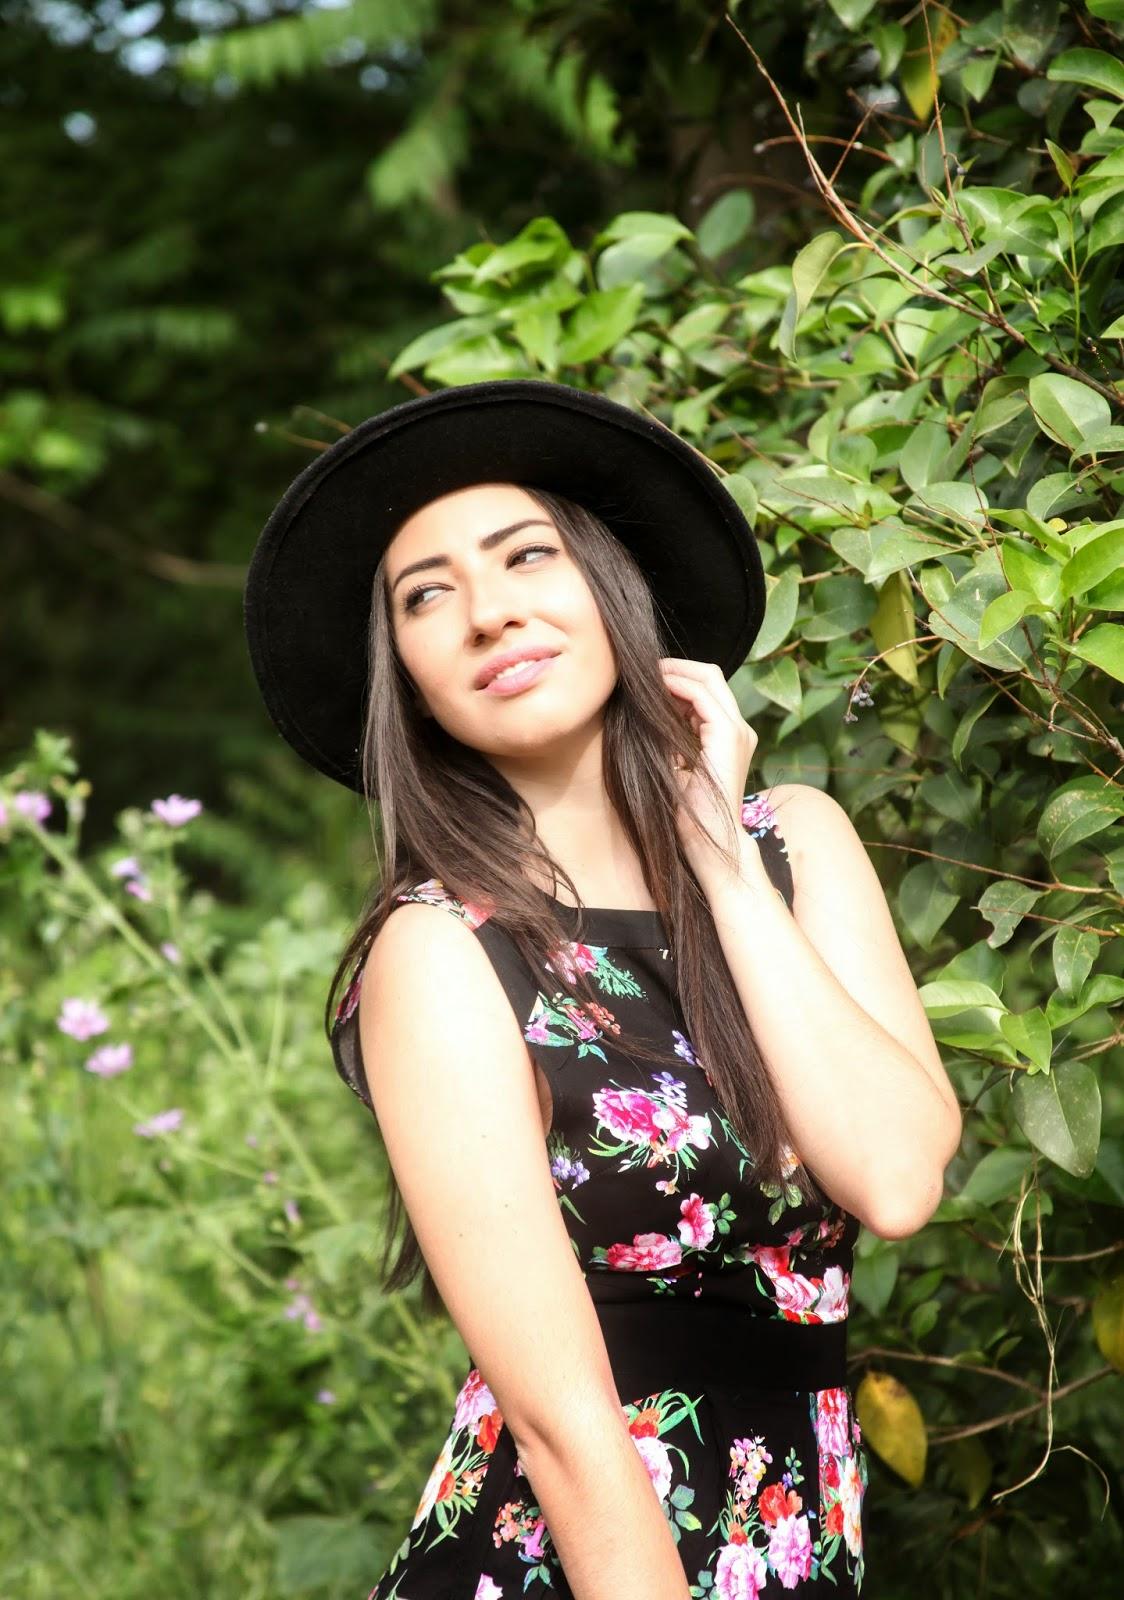 #Floral #Girl #Model #Fashionblogger #Christyandthecity